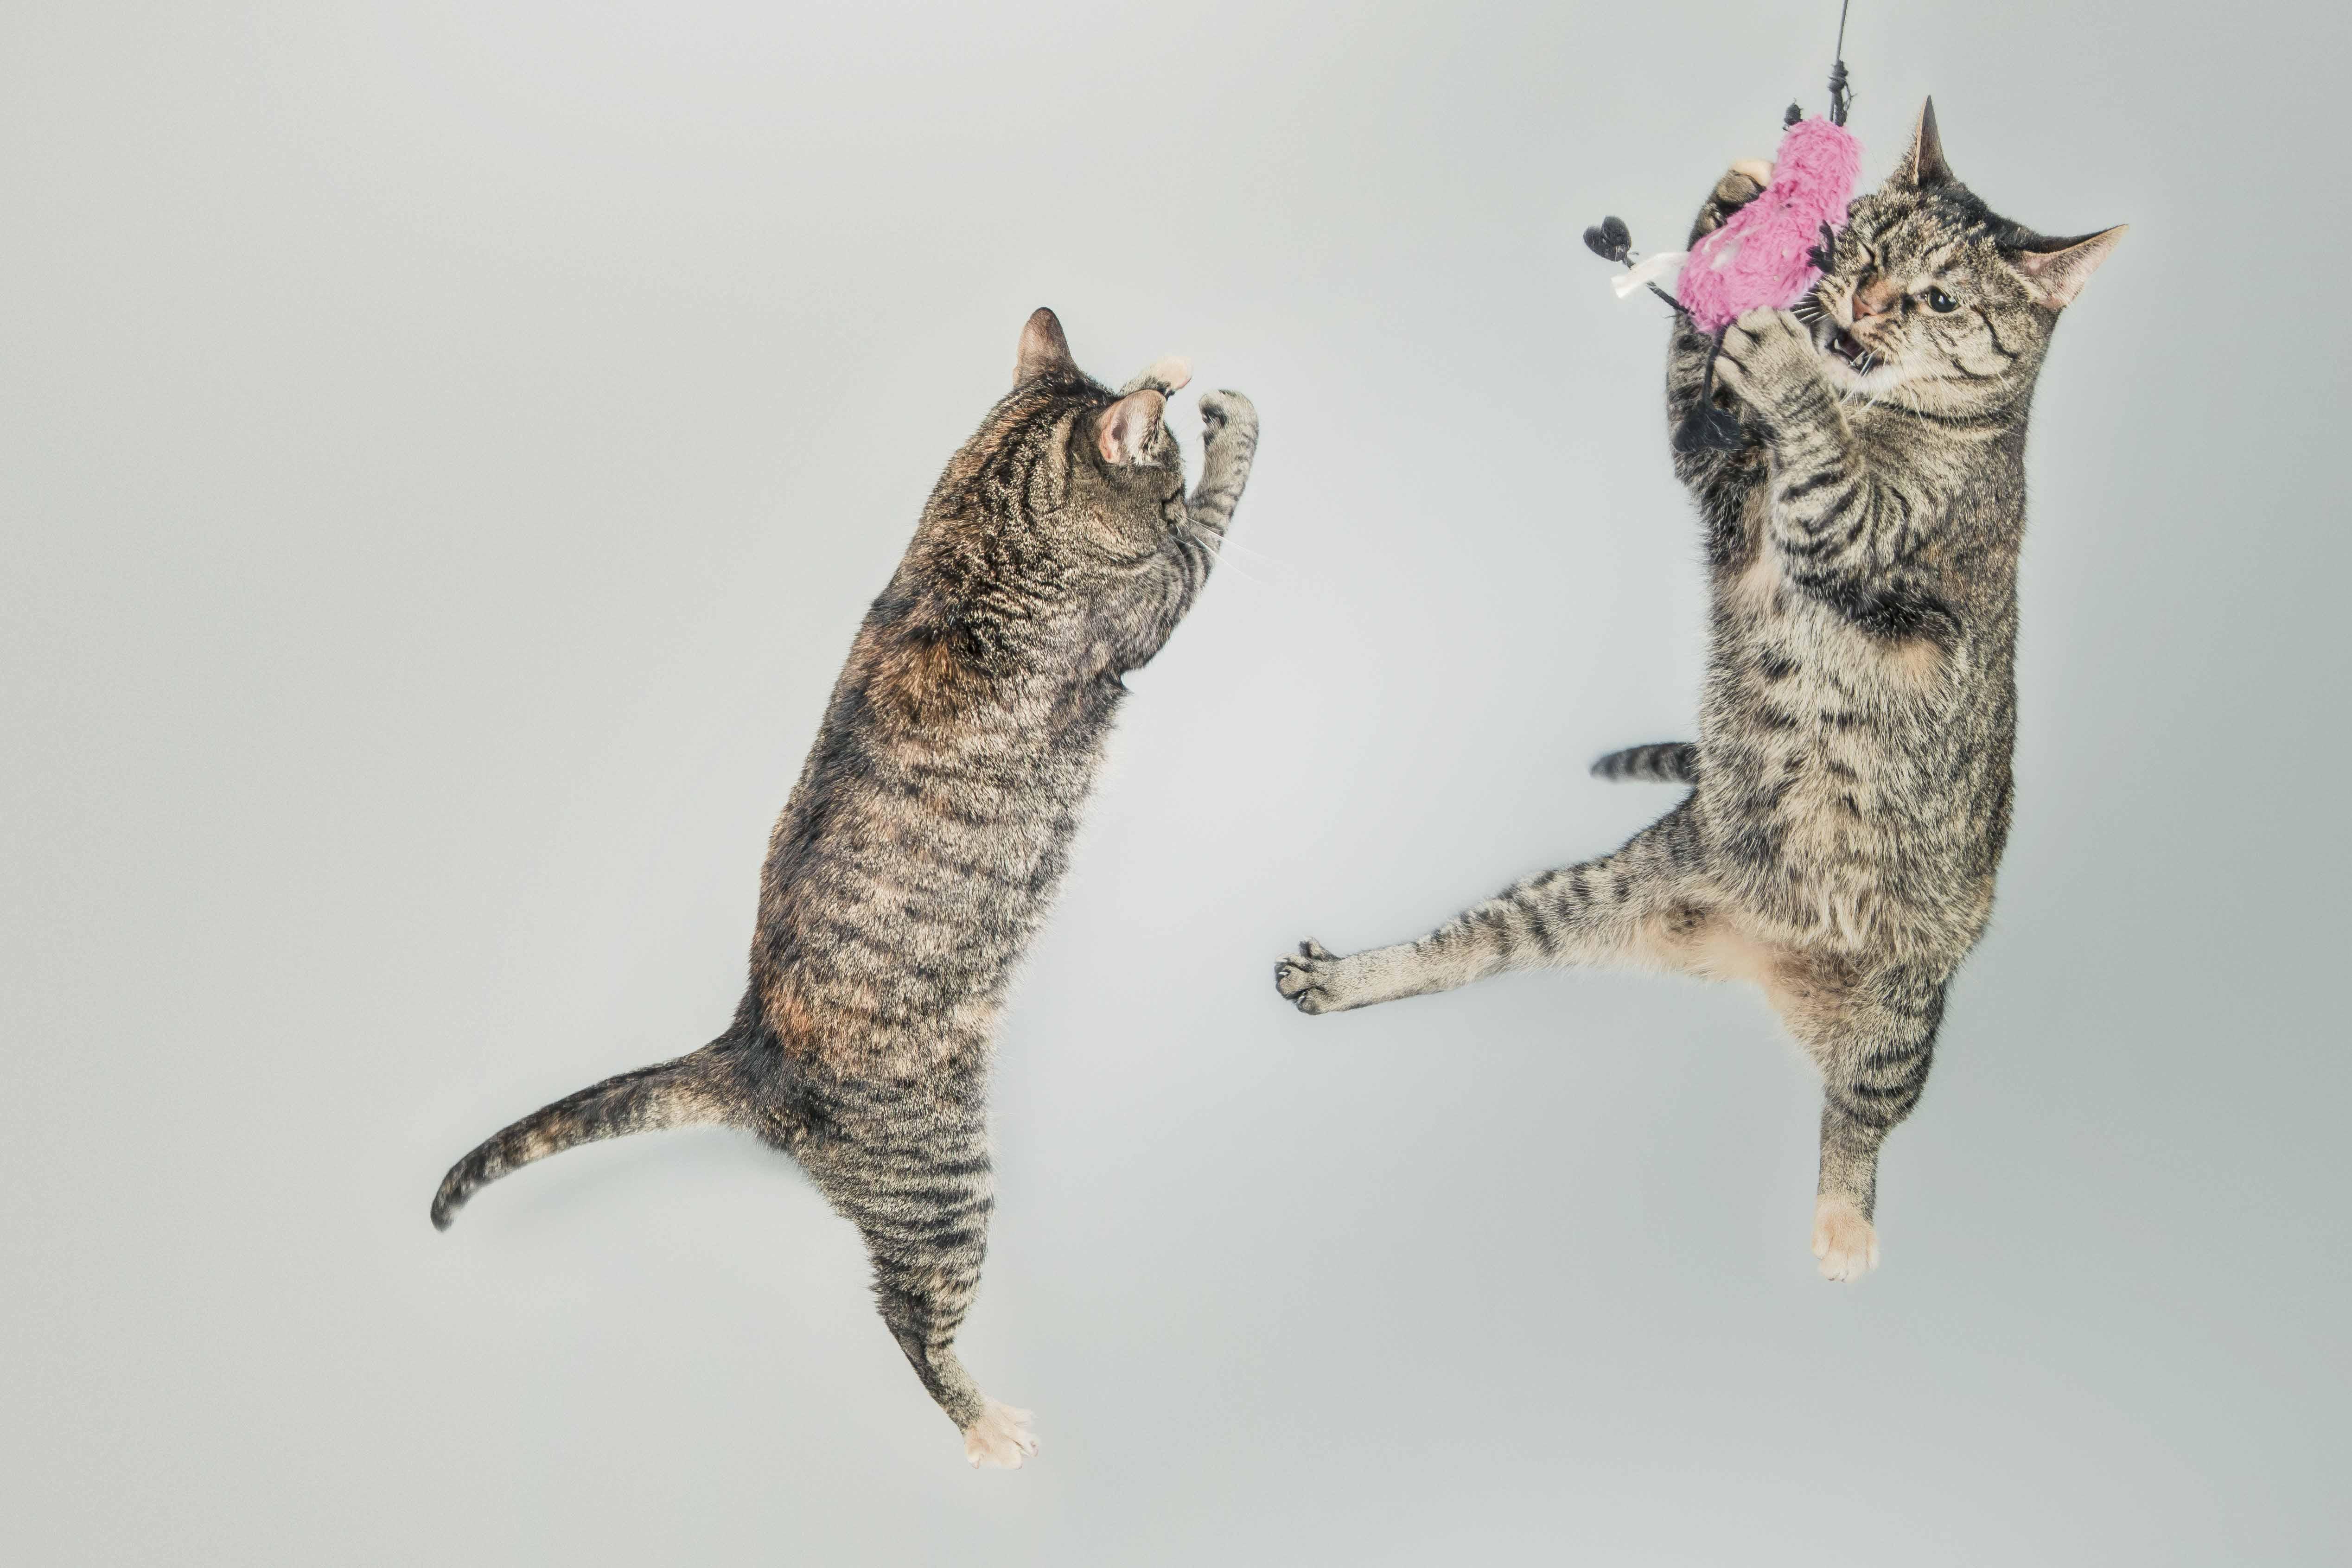 animales super graciosos fotografia (13)